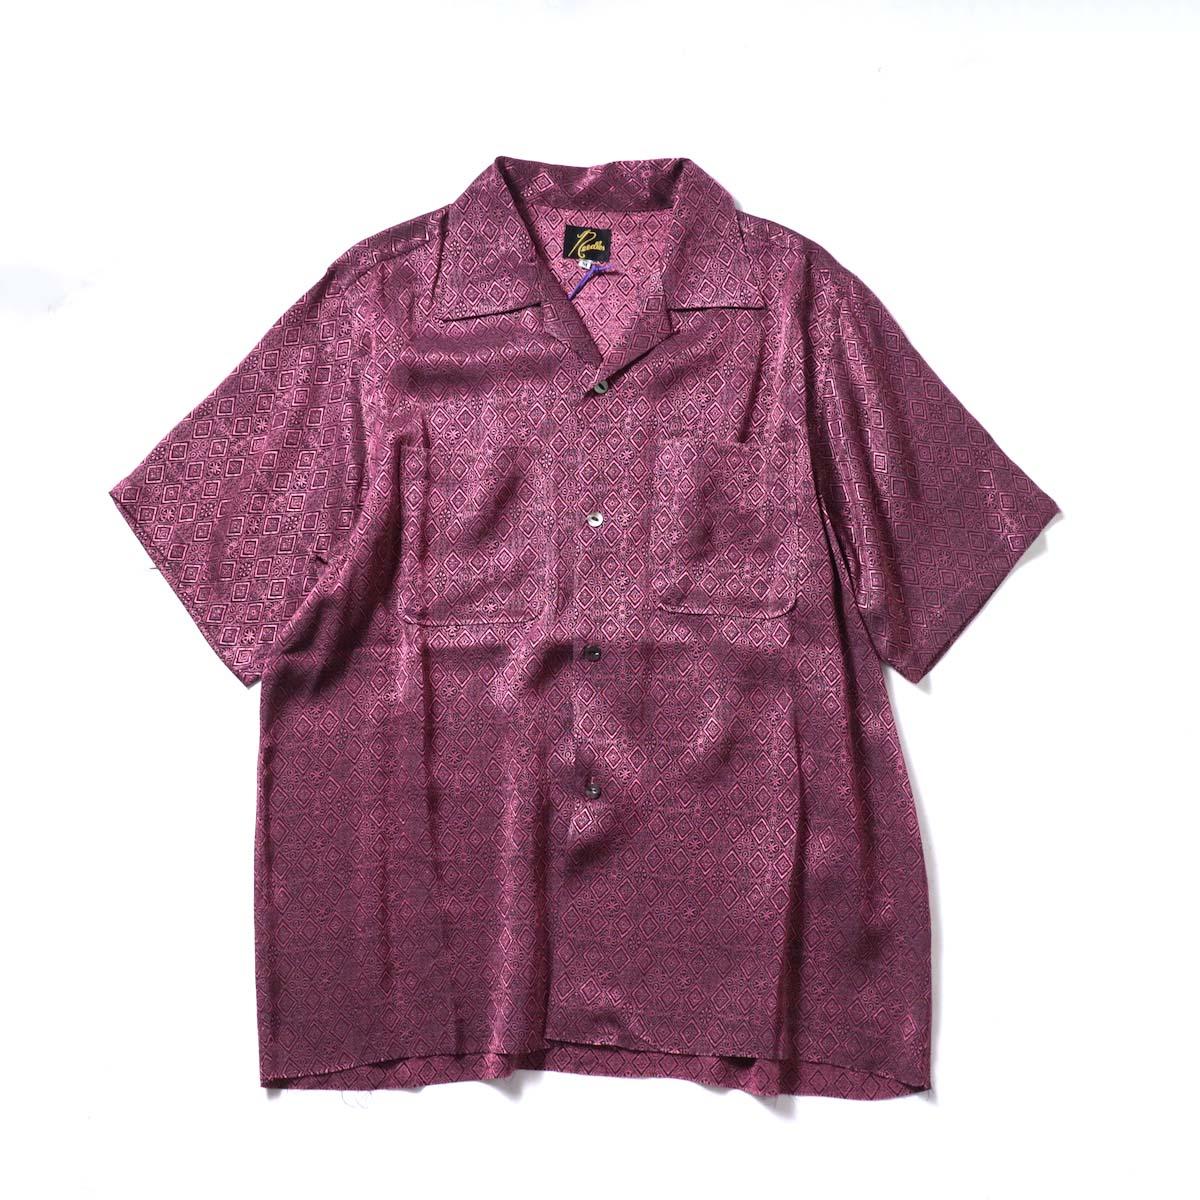 Needles / C.O.B. S/S One-Up Shirt -Fine Pattern Jq. (Diamond)